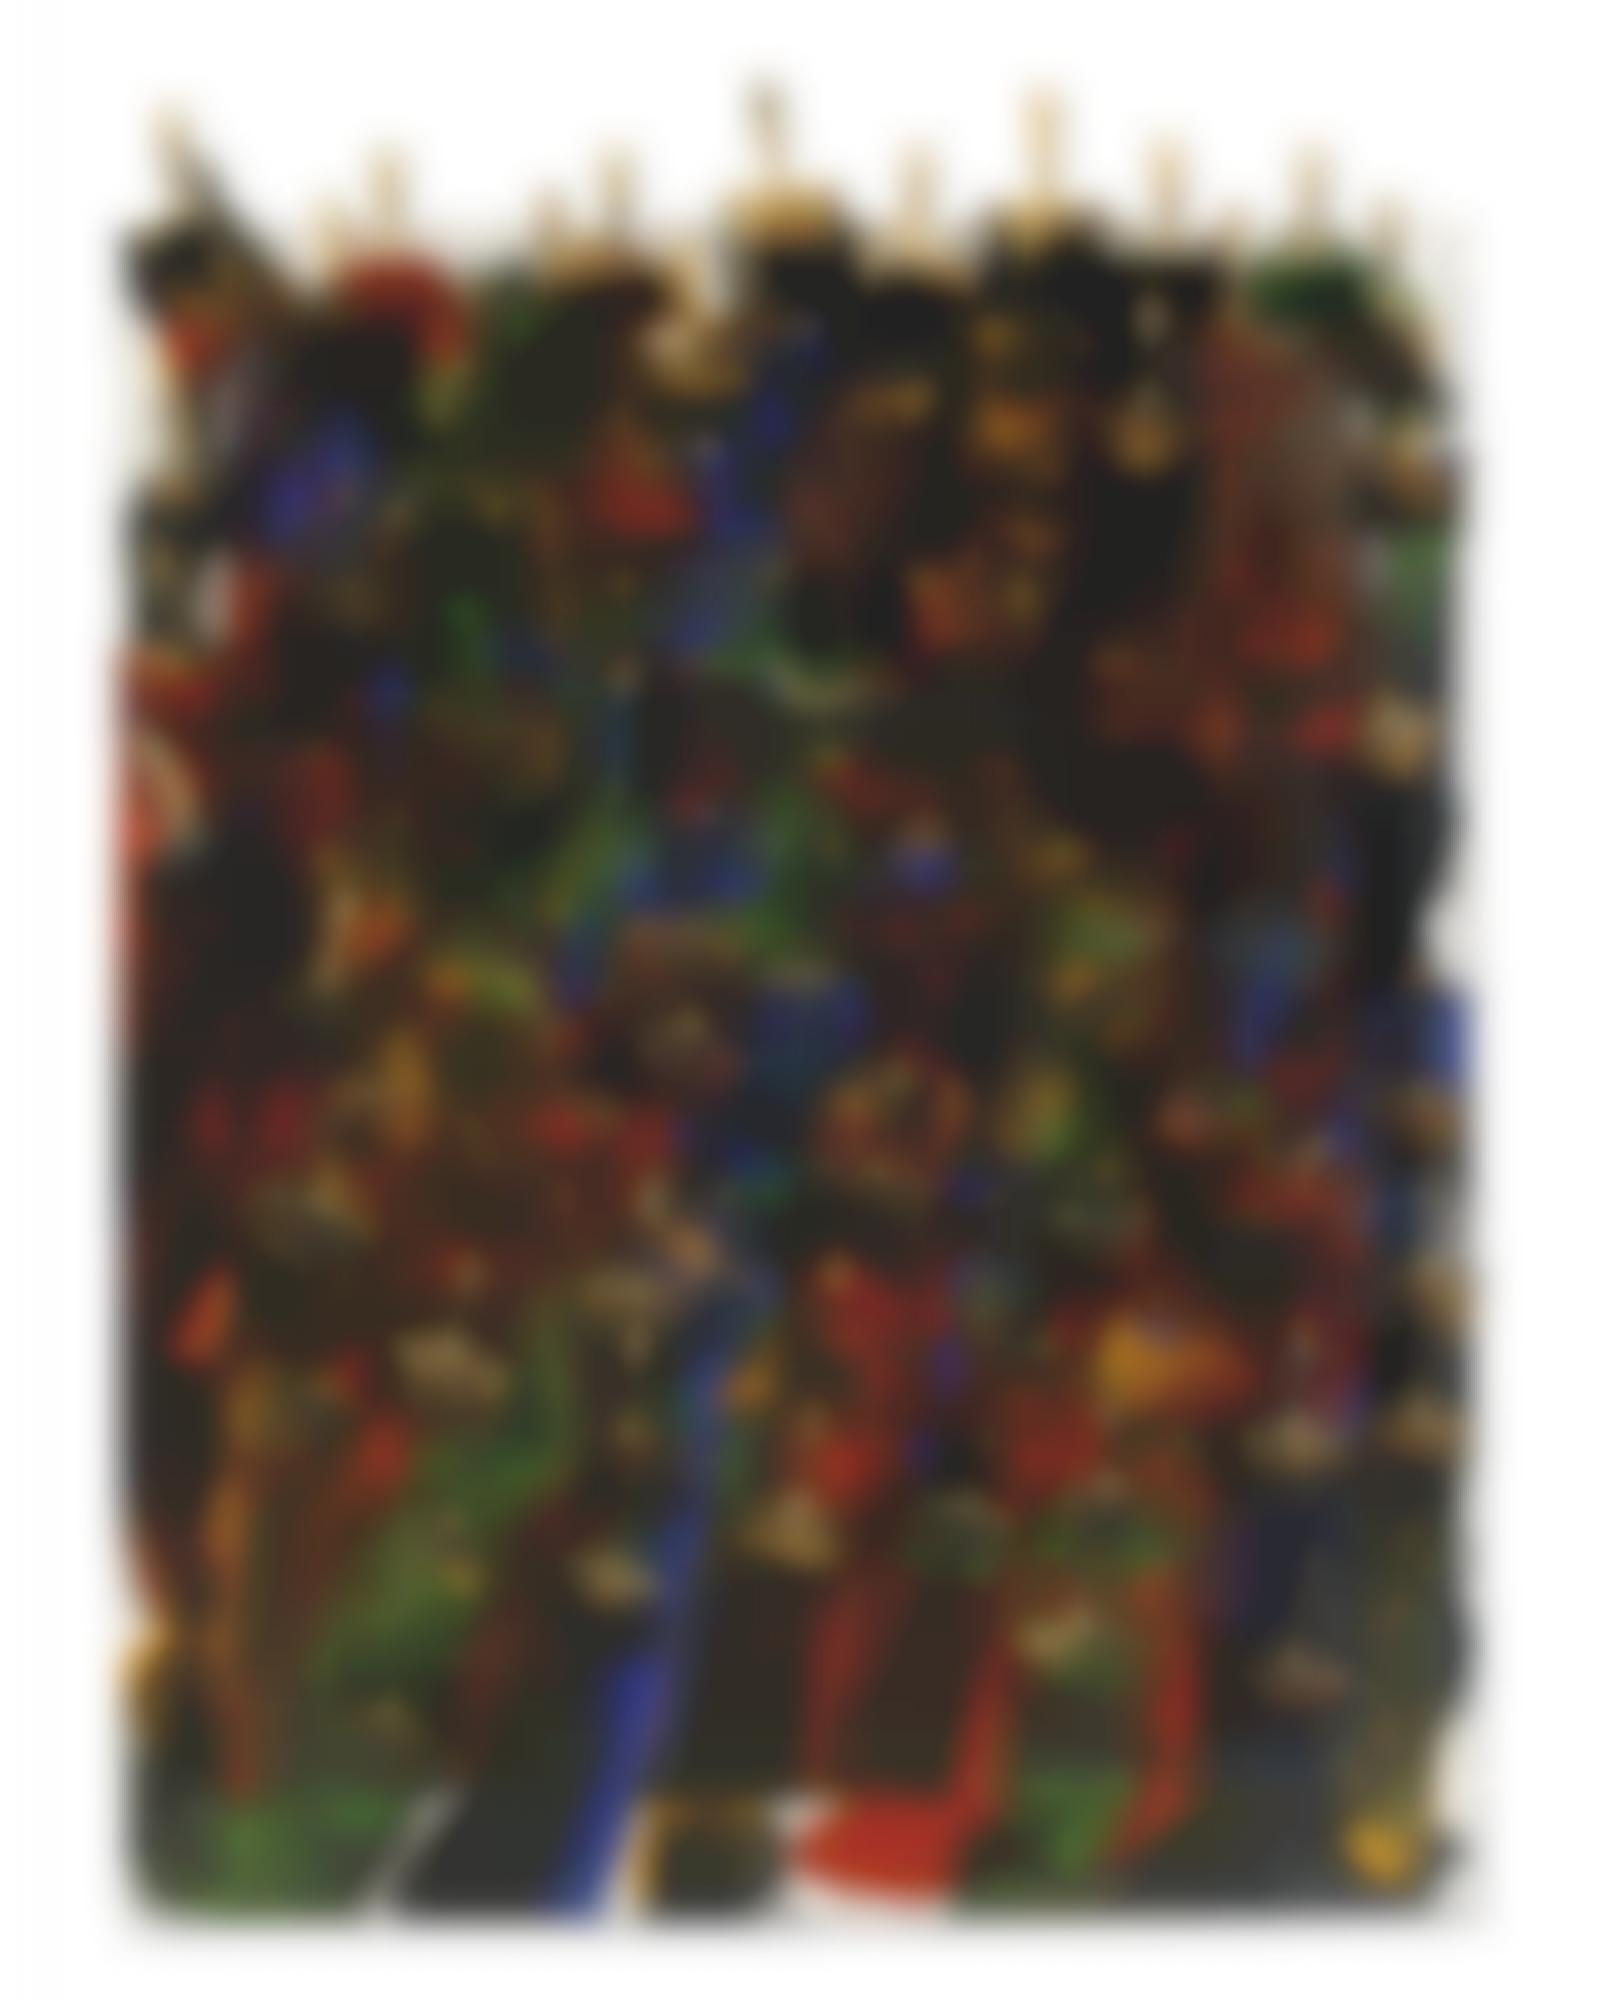 Arman-Untitled-1987